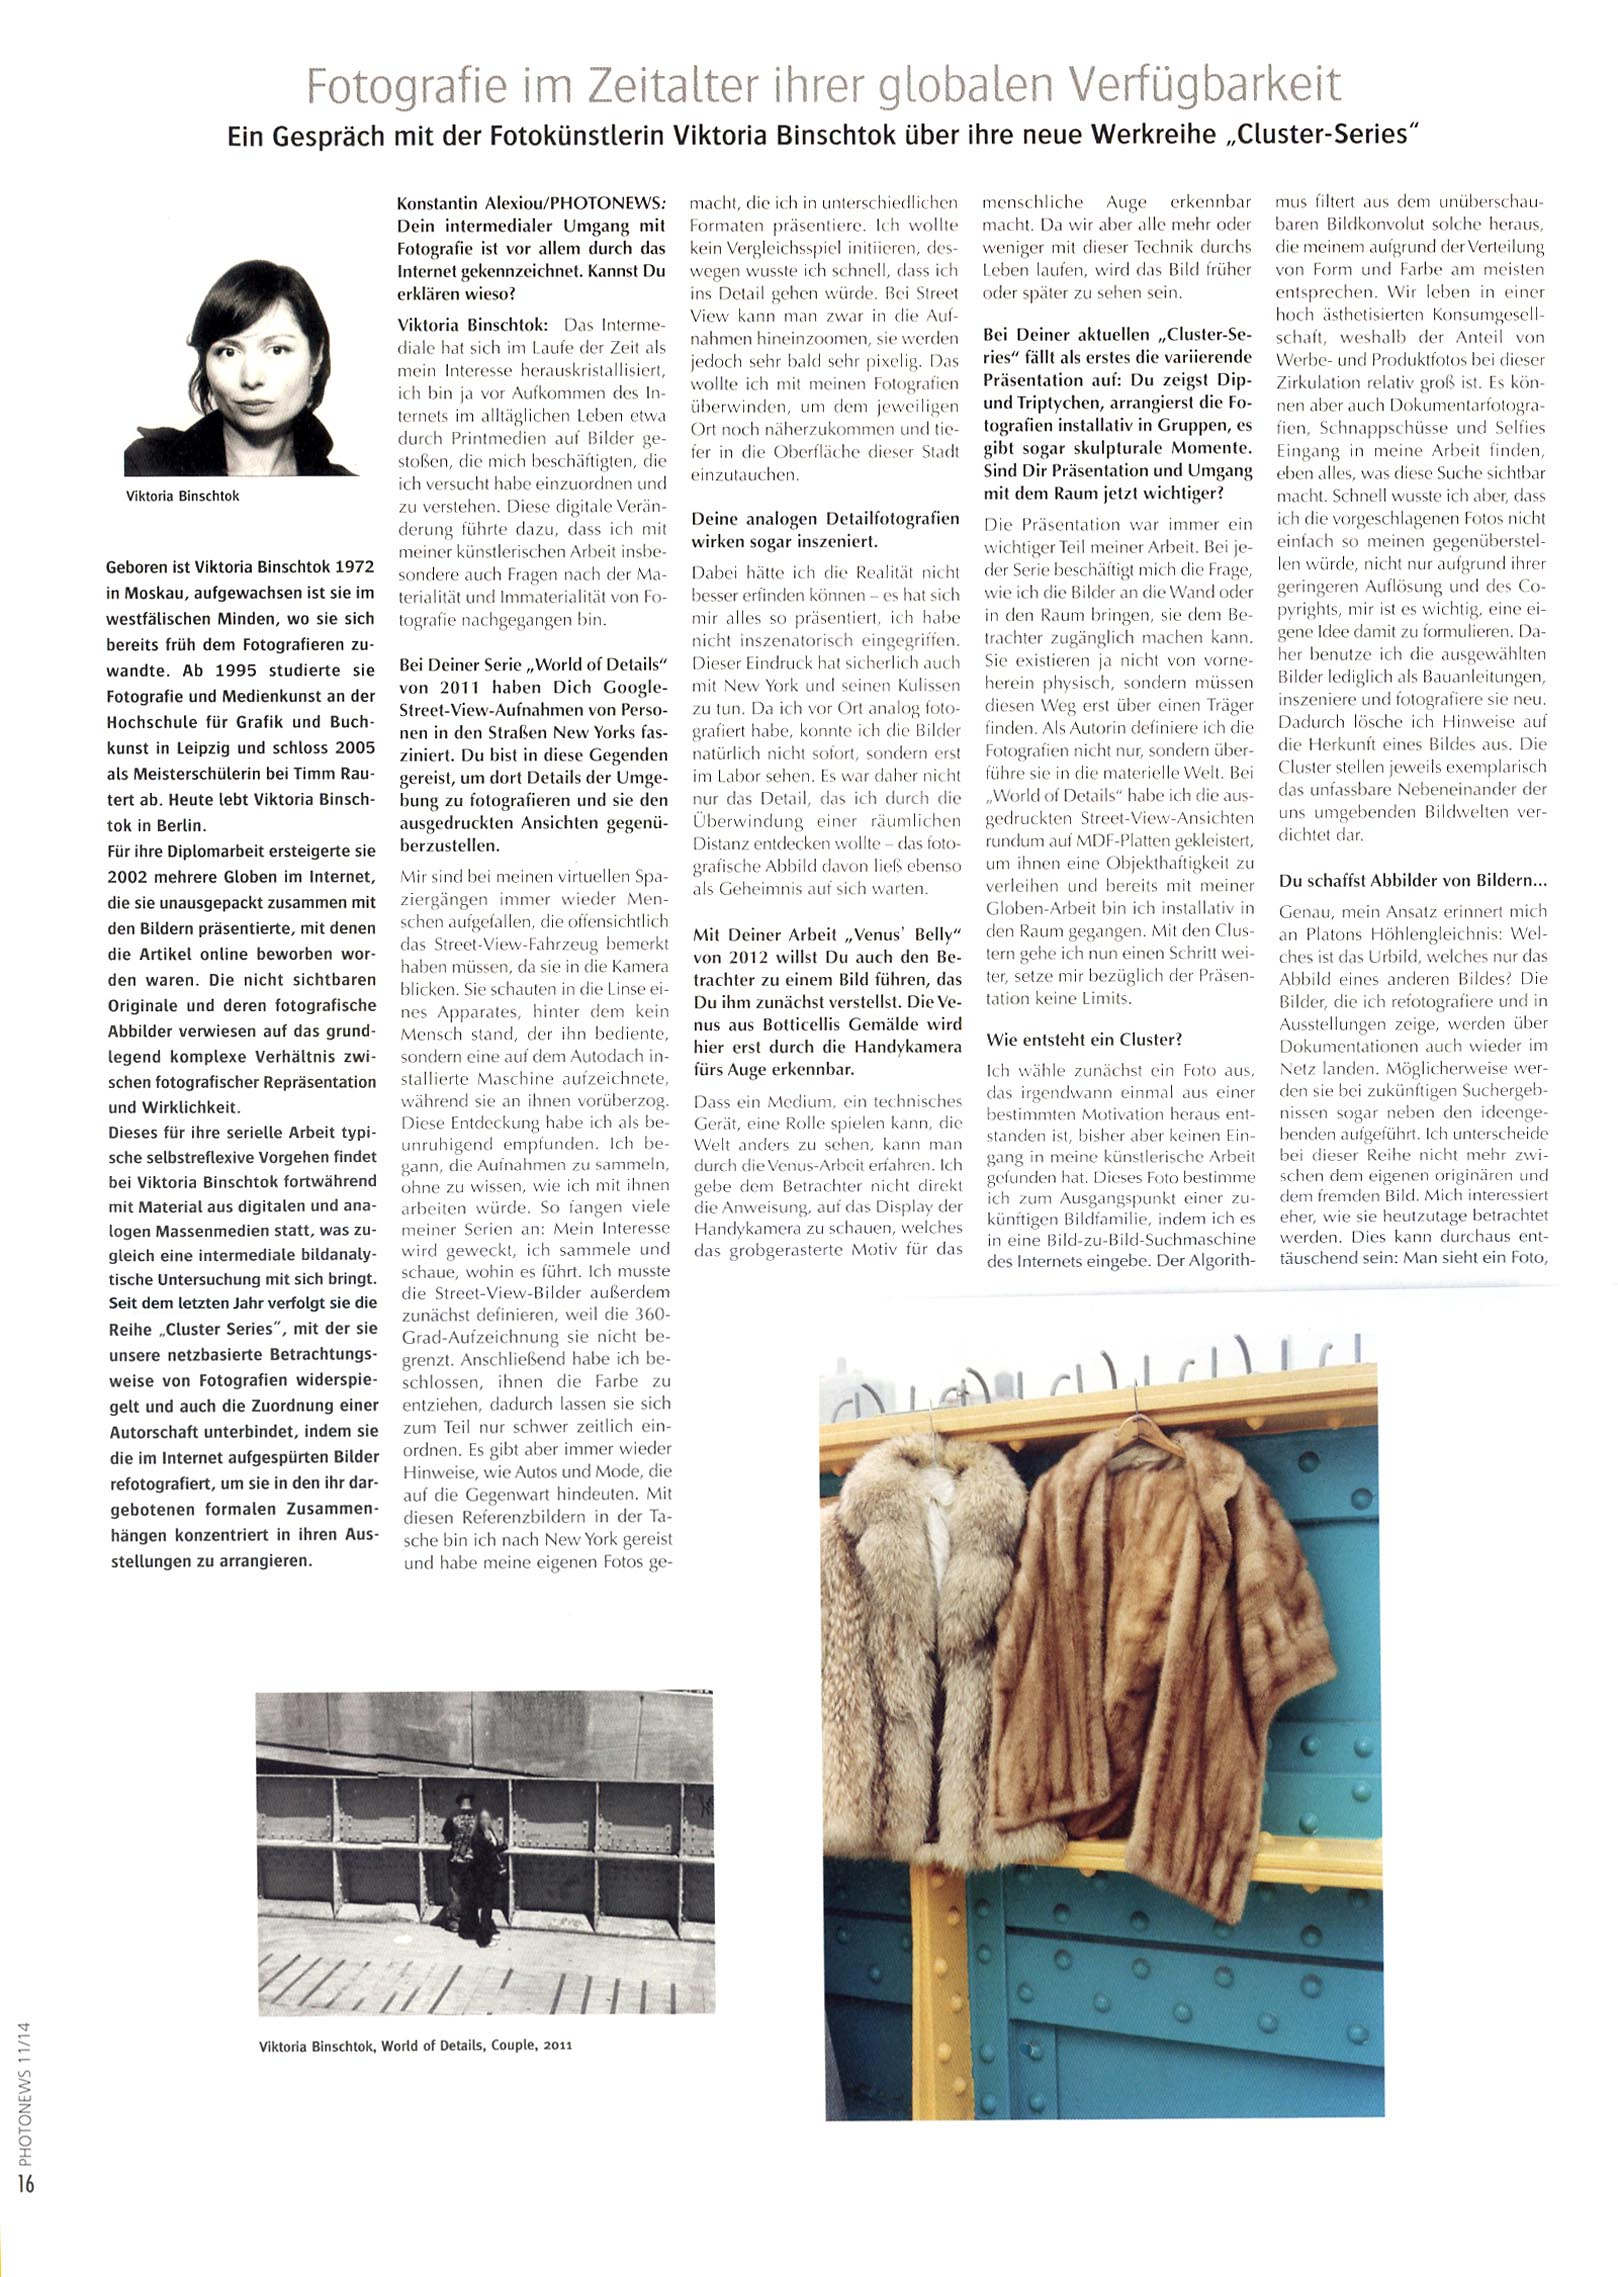 VBphotonews-small